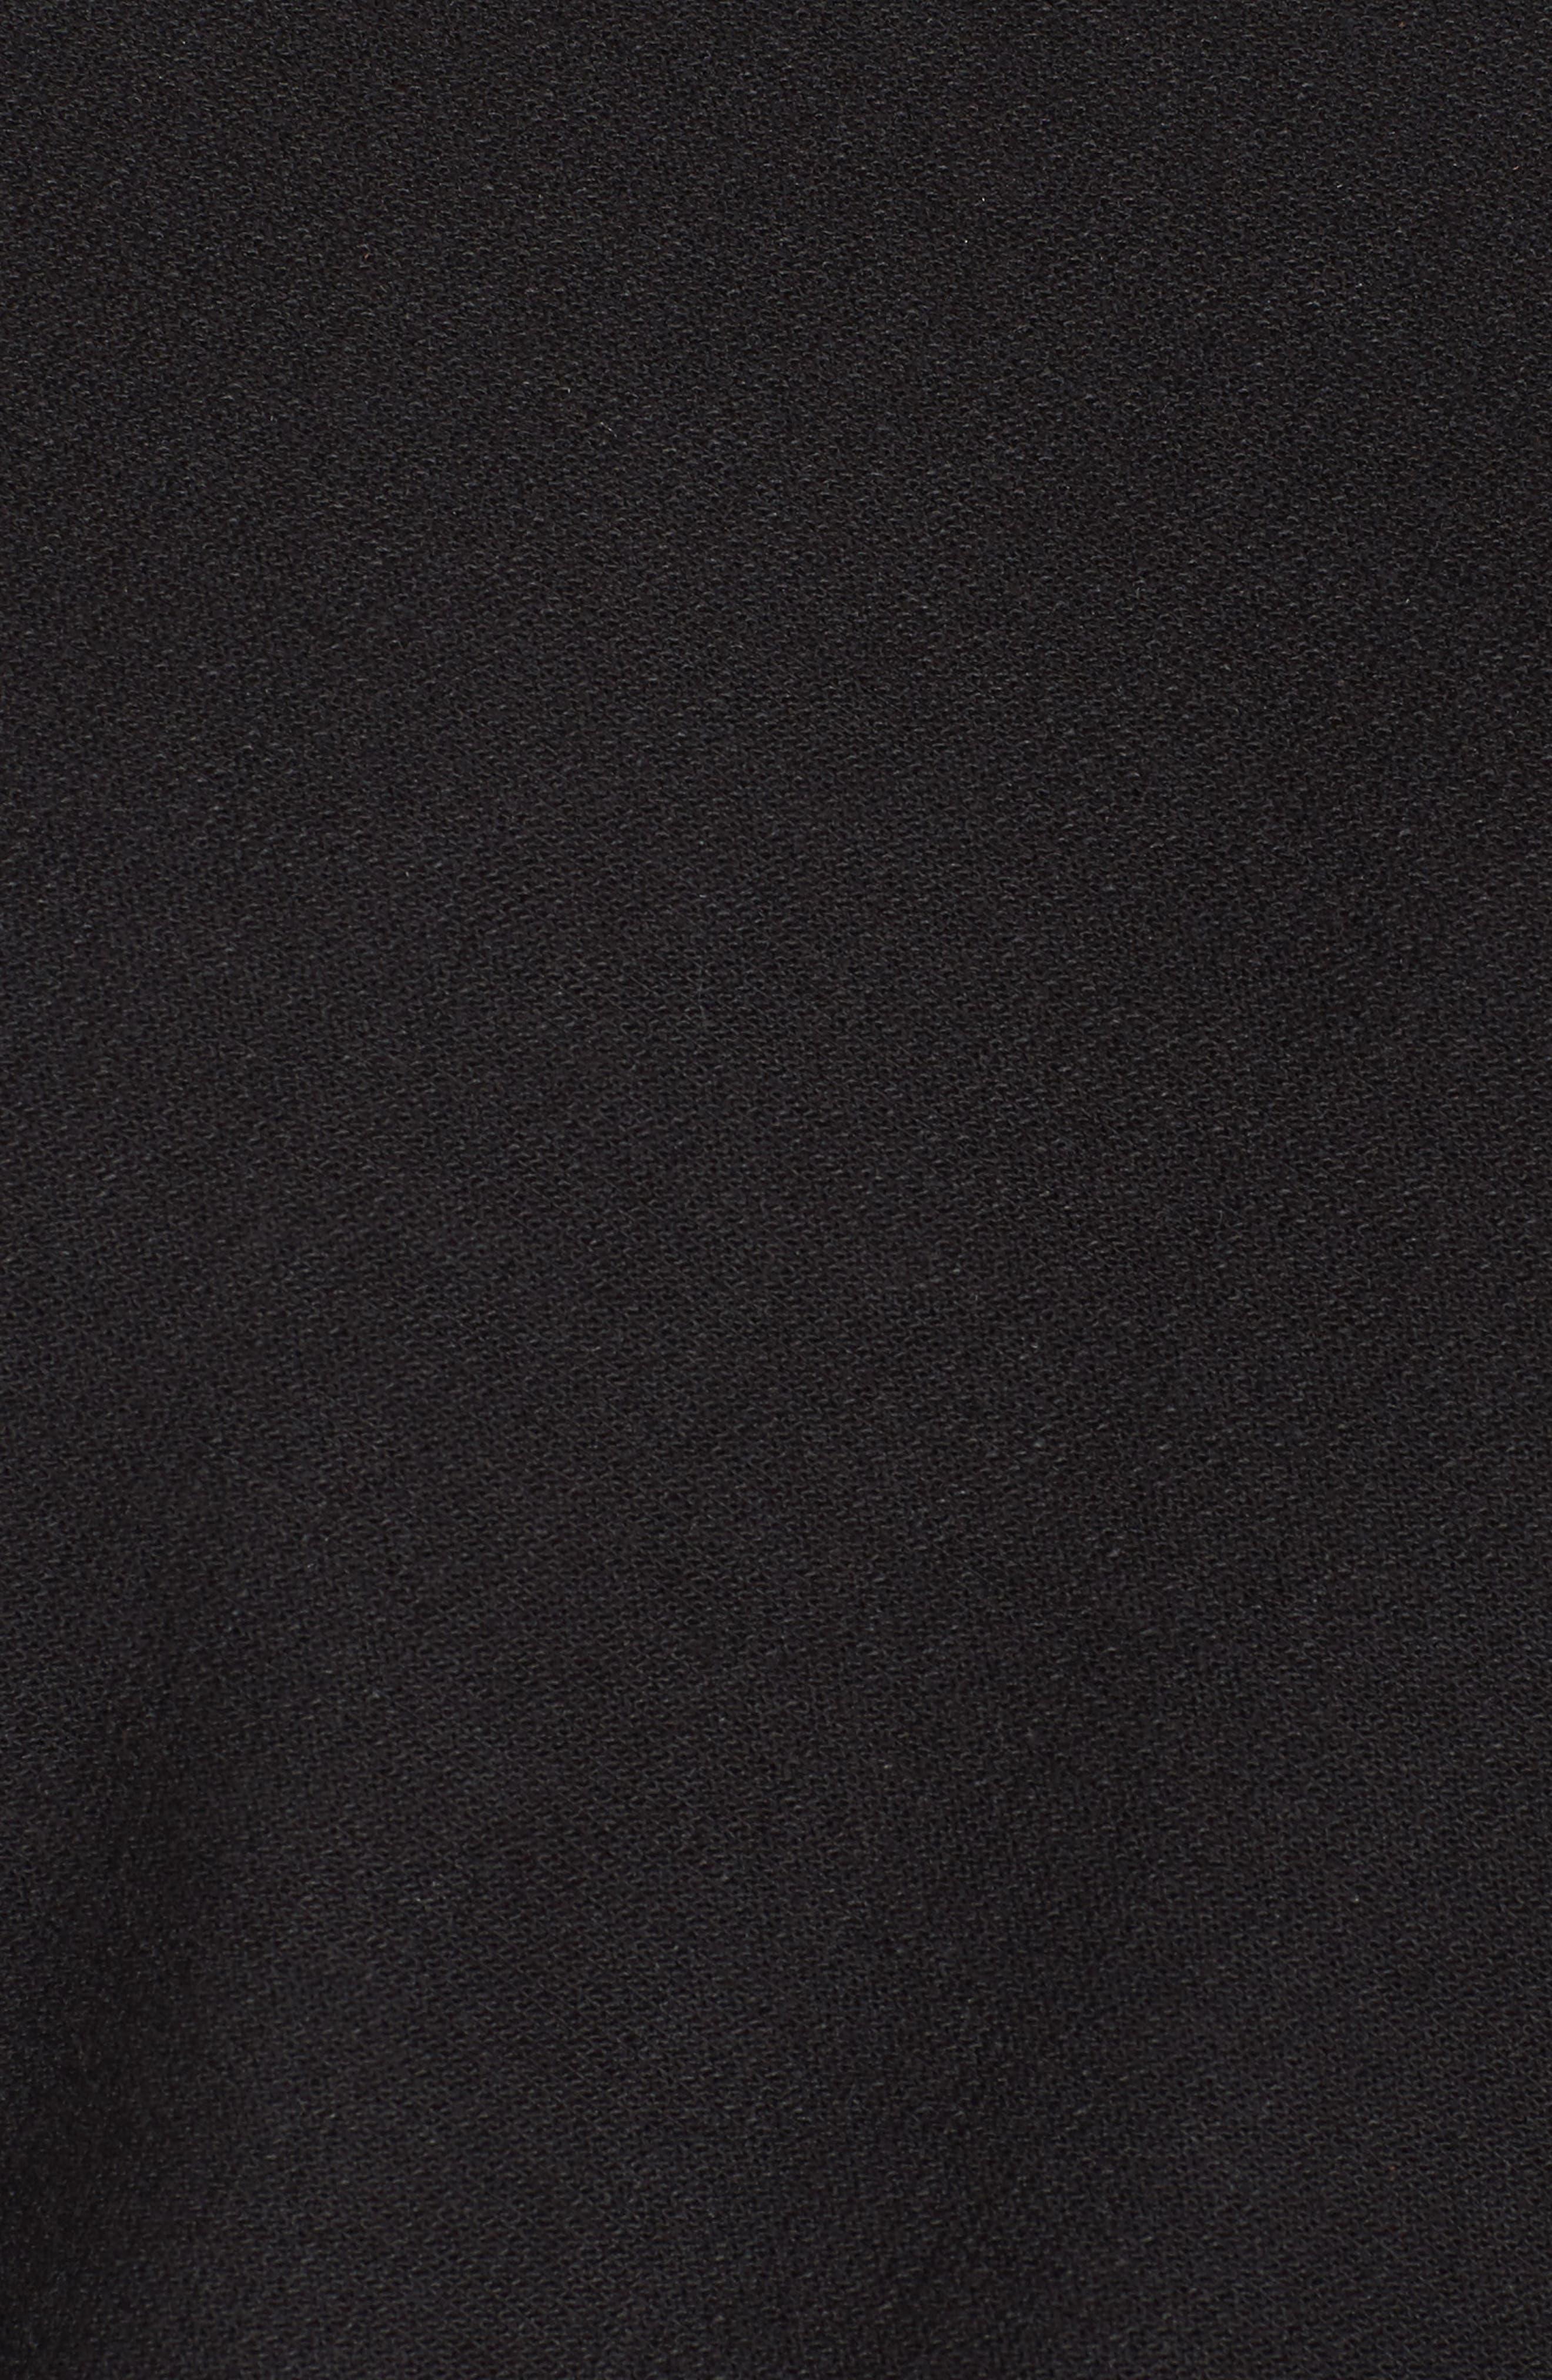 Soleil Funnel Neck Crop Pullover,                             Alternate thumbnail 6, color,                             Black